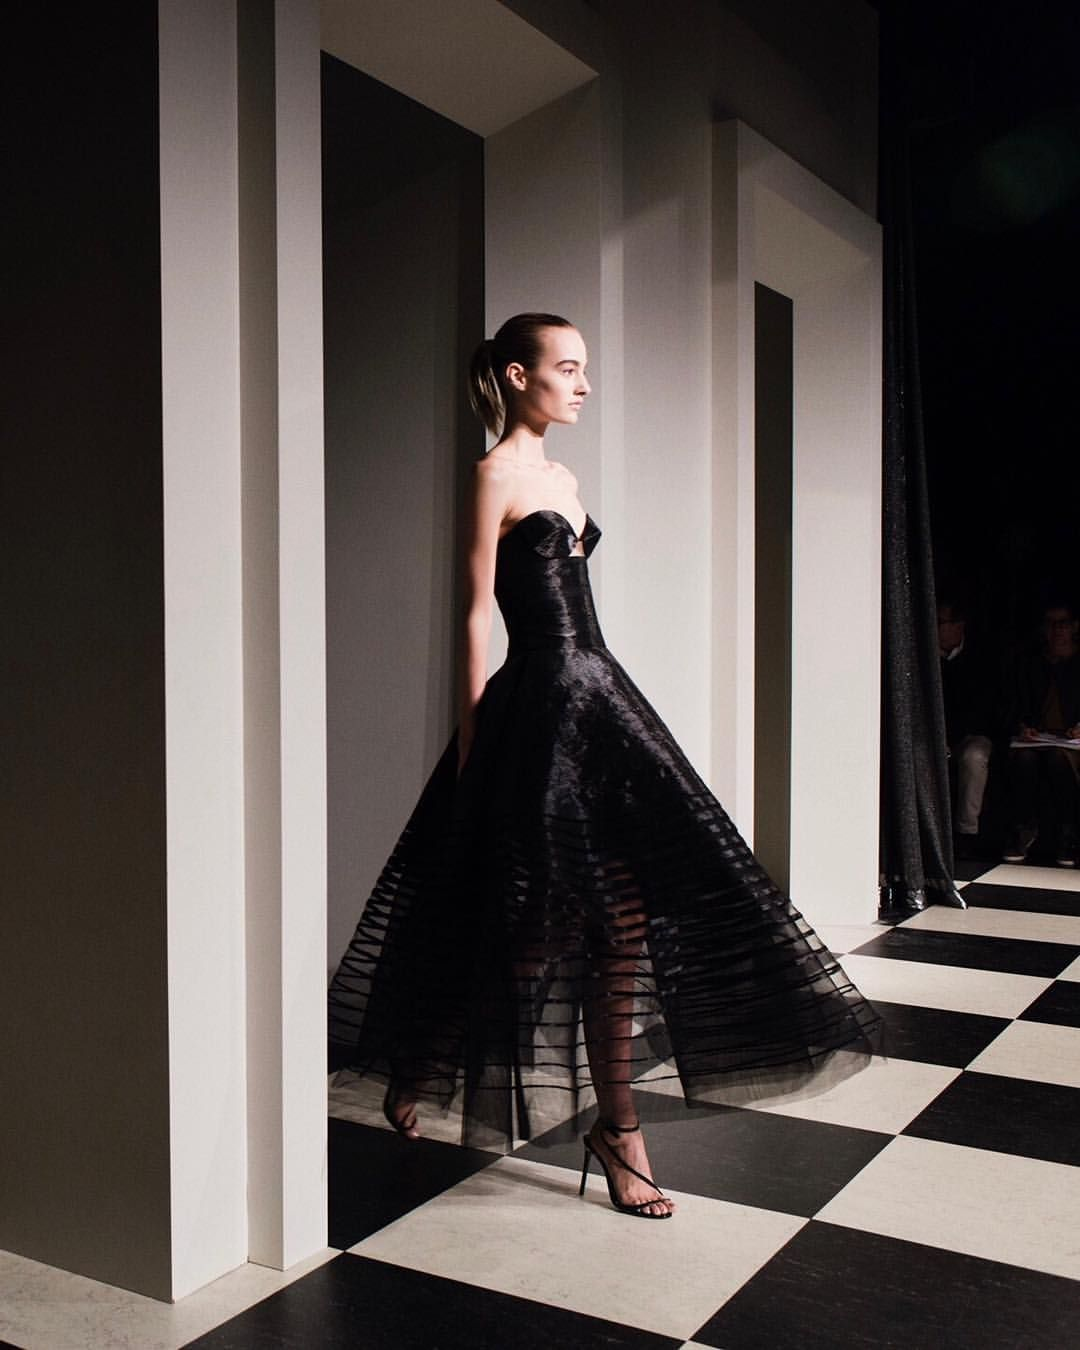 "8,554 Likes, 50 Comments - Oscar de la Renta (@oscardelarenta) on Instagram: ""Metallic thread puts a fashion forward take on this classic design. #Fall17 #oscardelarenta"""